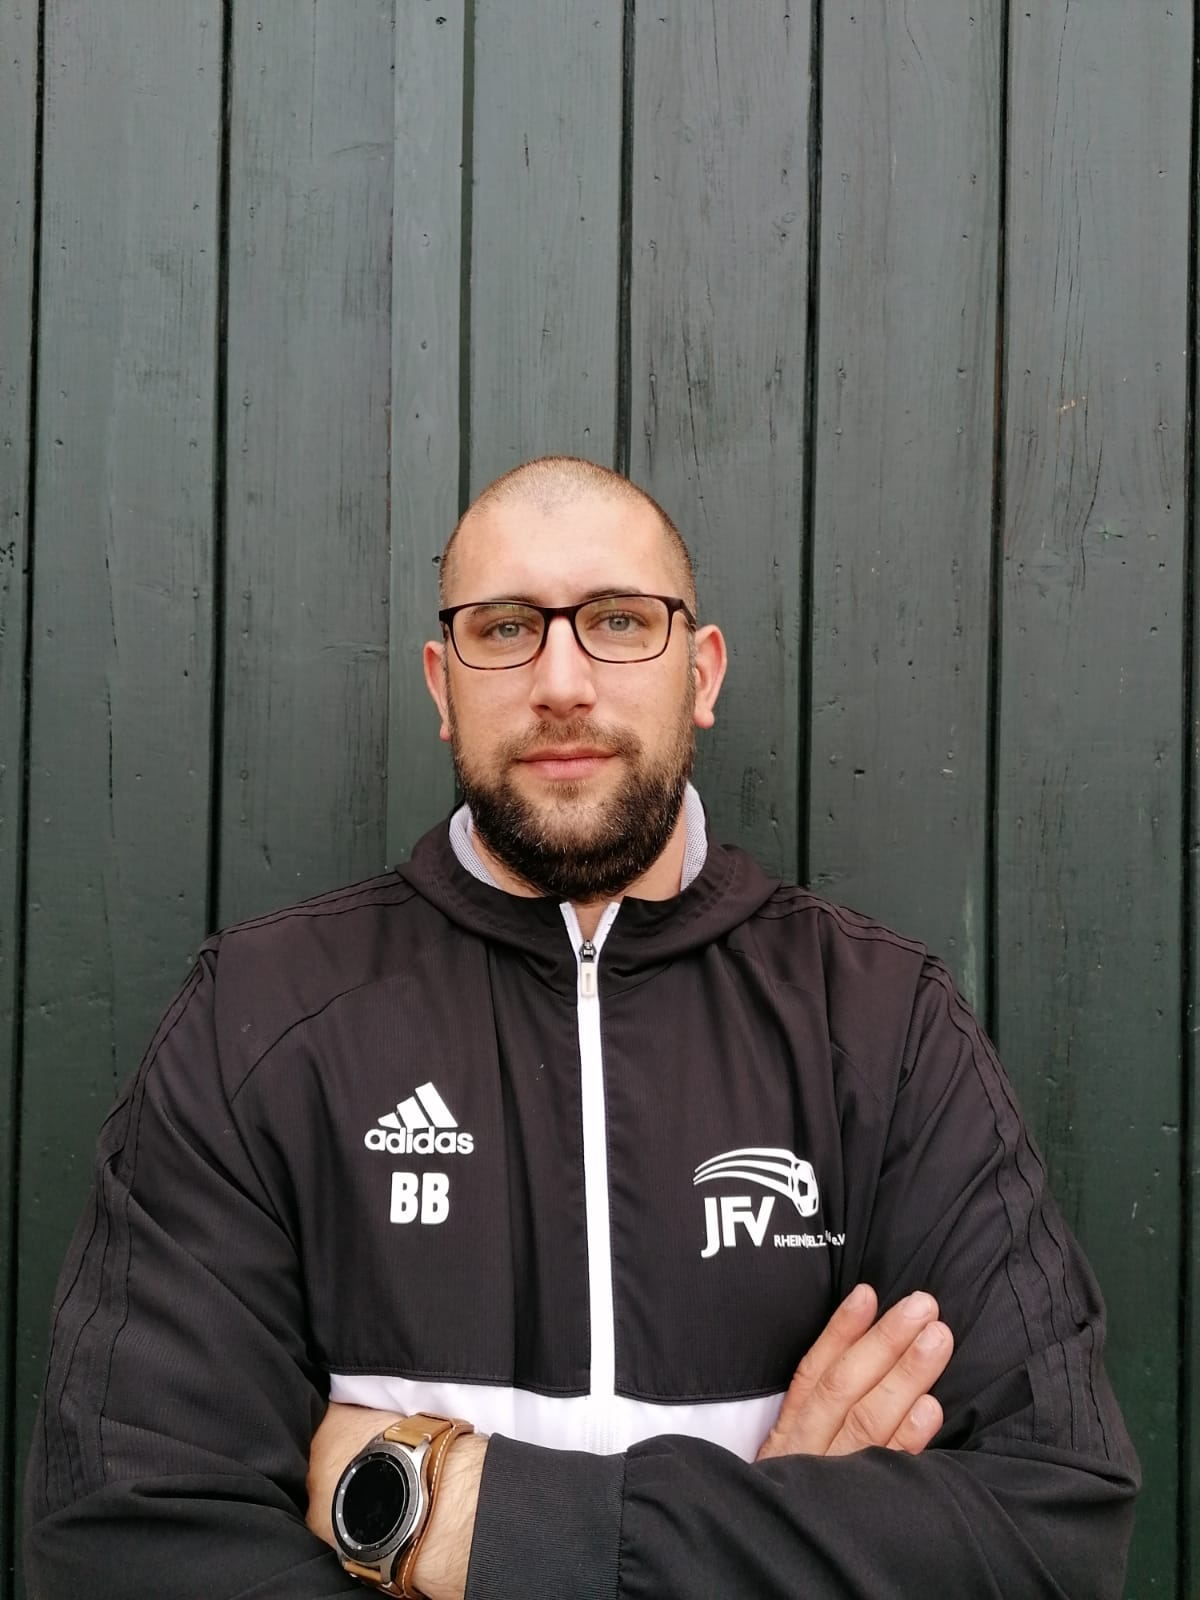 Bernt Bloos - Stv. Jugendkoordinator JFV Rhein-Selz 2016